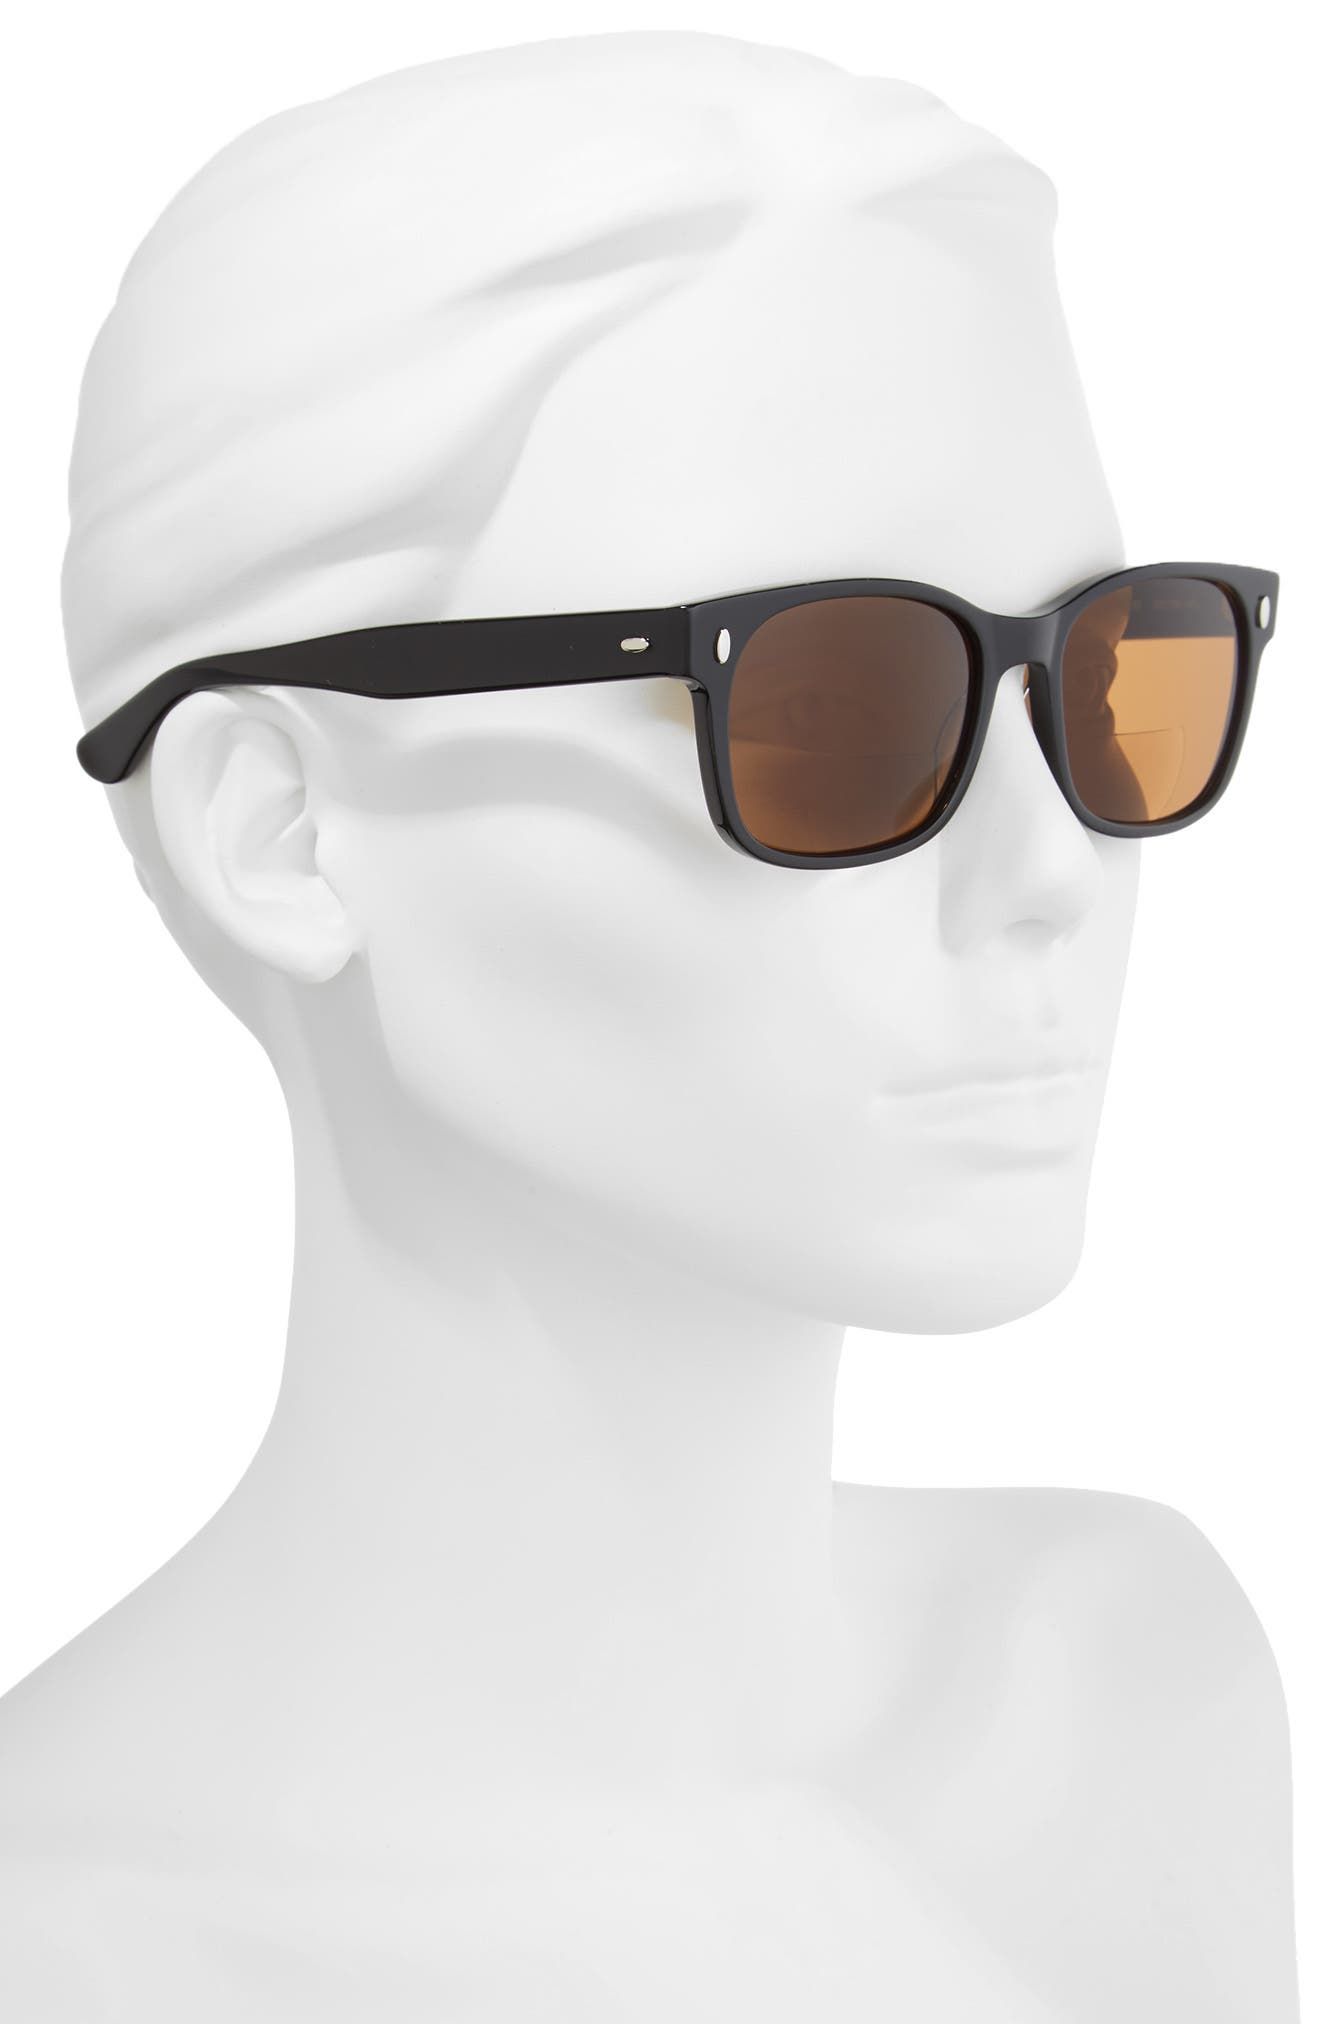 Whitney 52mm Reading Sunglasses,                             Alternate thumbnail 2, color,                             Black